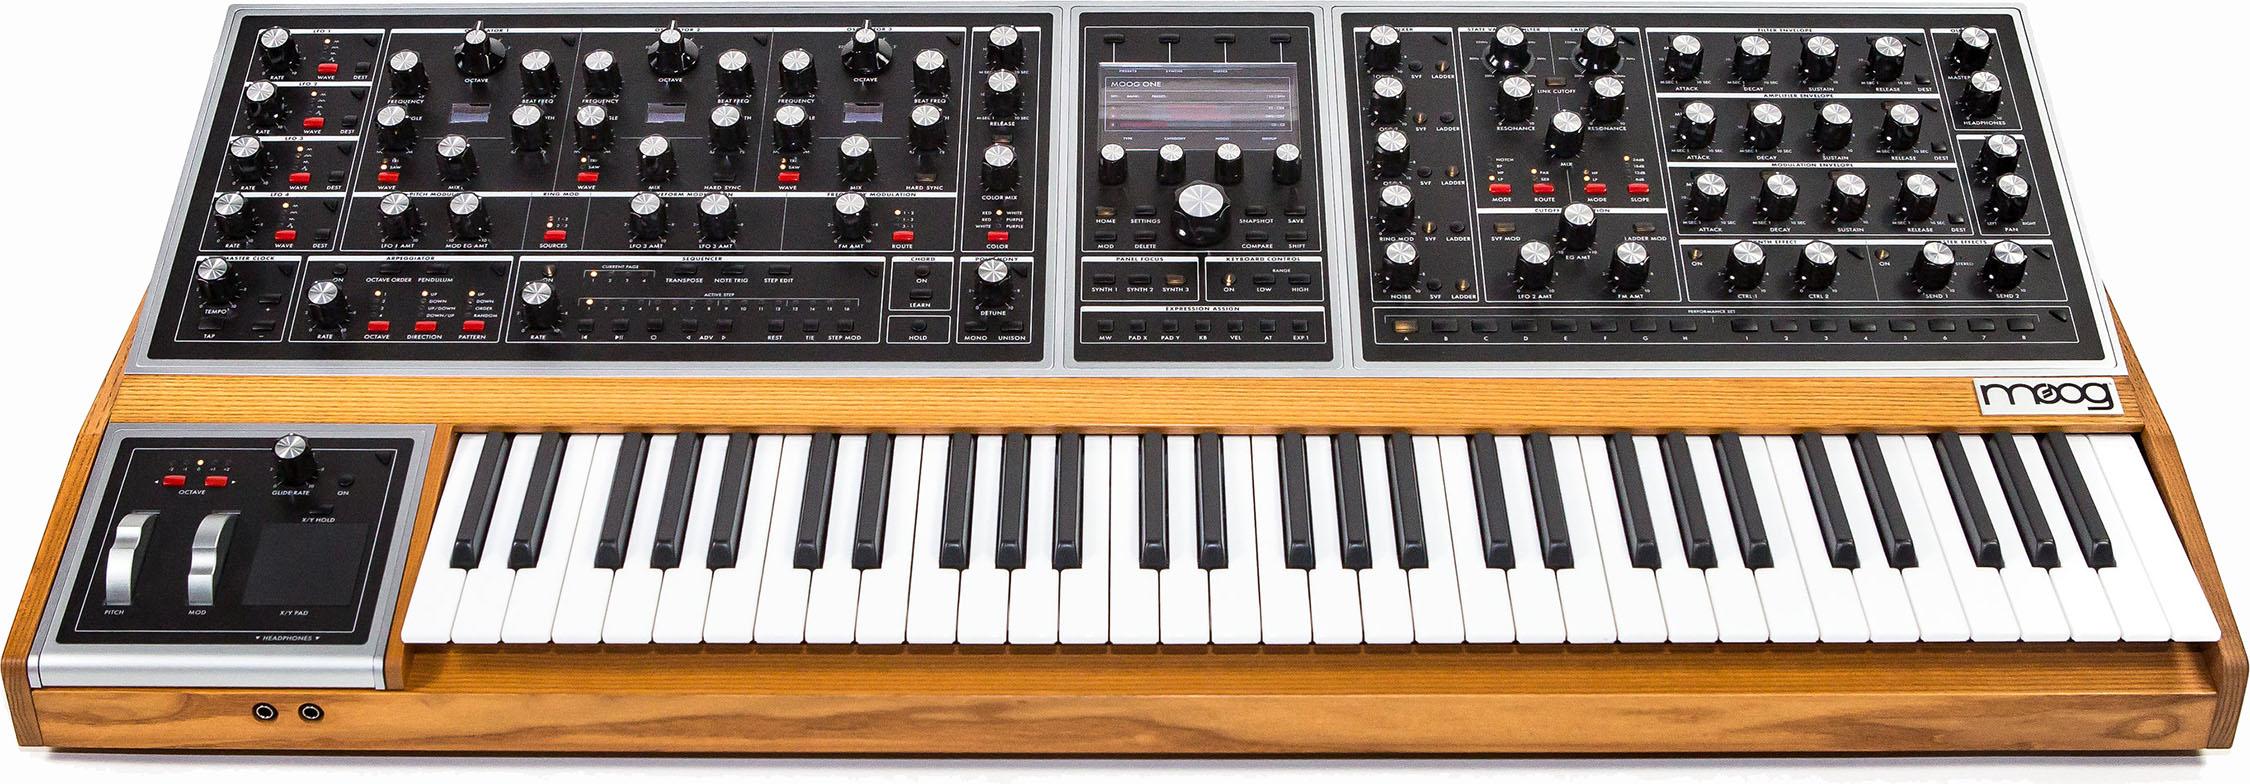 Moog One - Finally a true monster polyphonic Moog